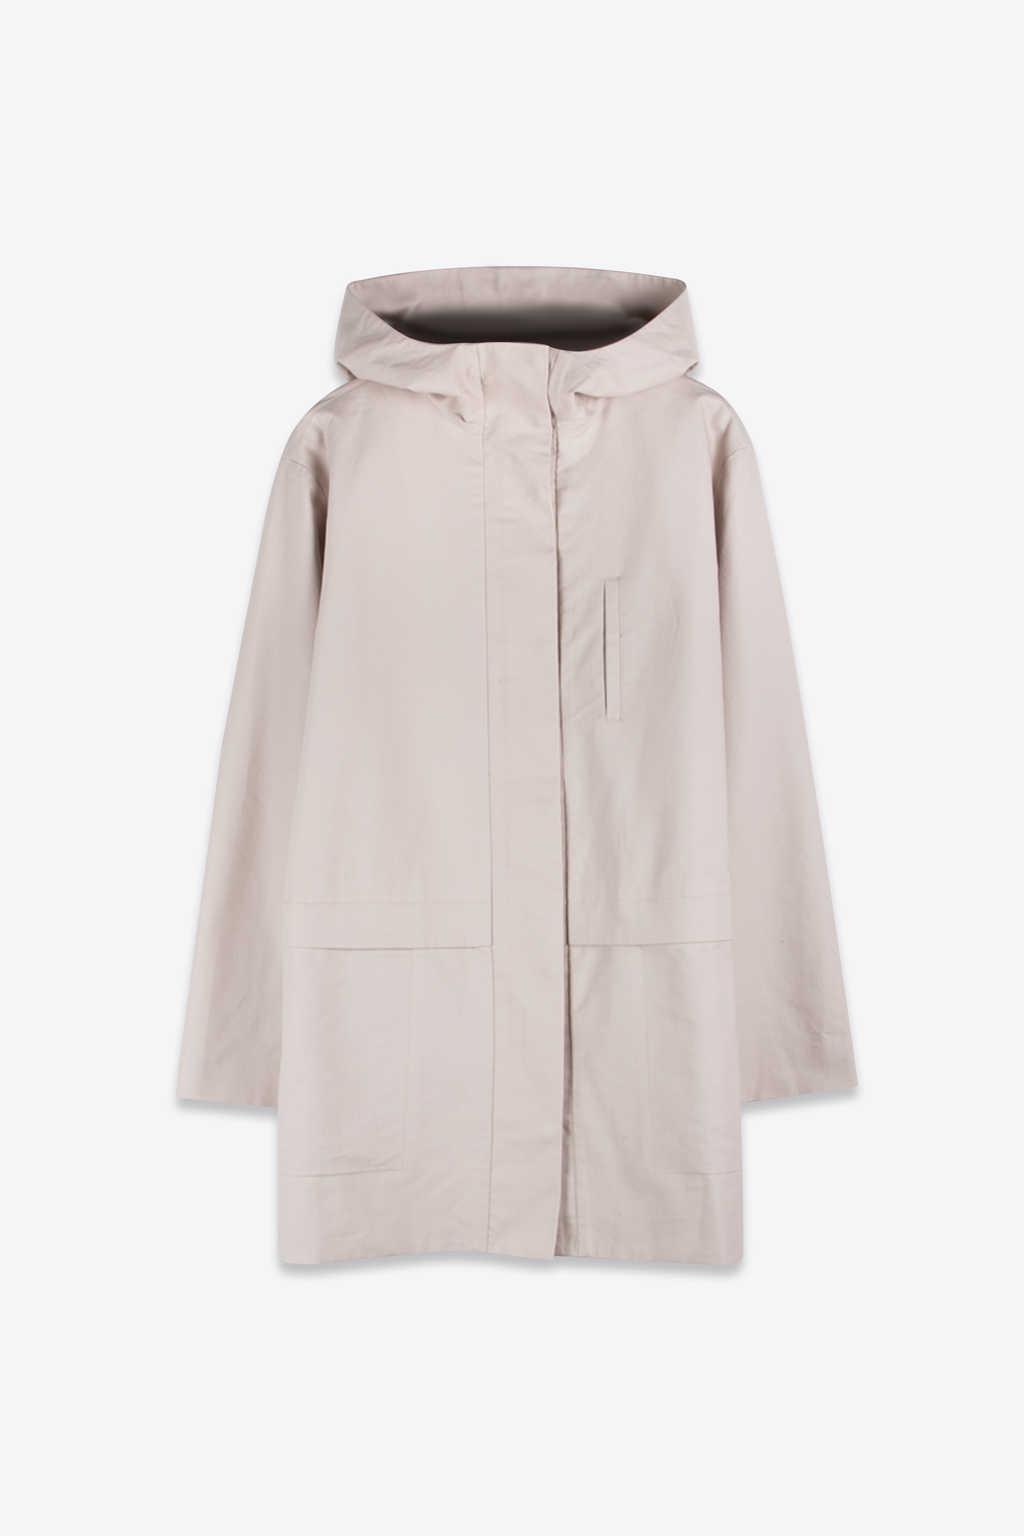 Jacket 1061 Beige 6